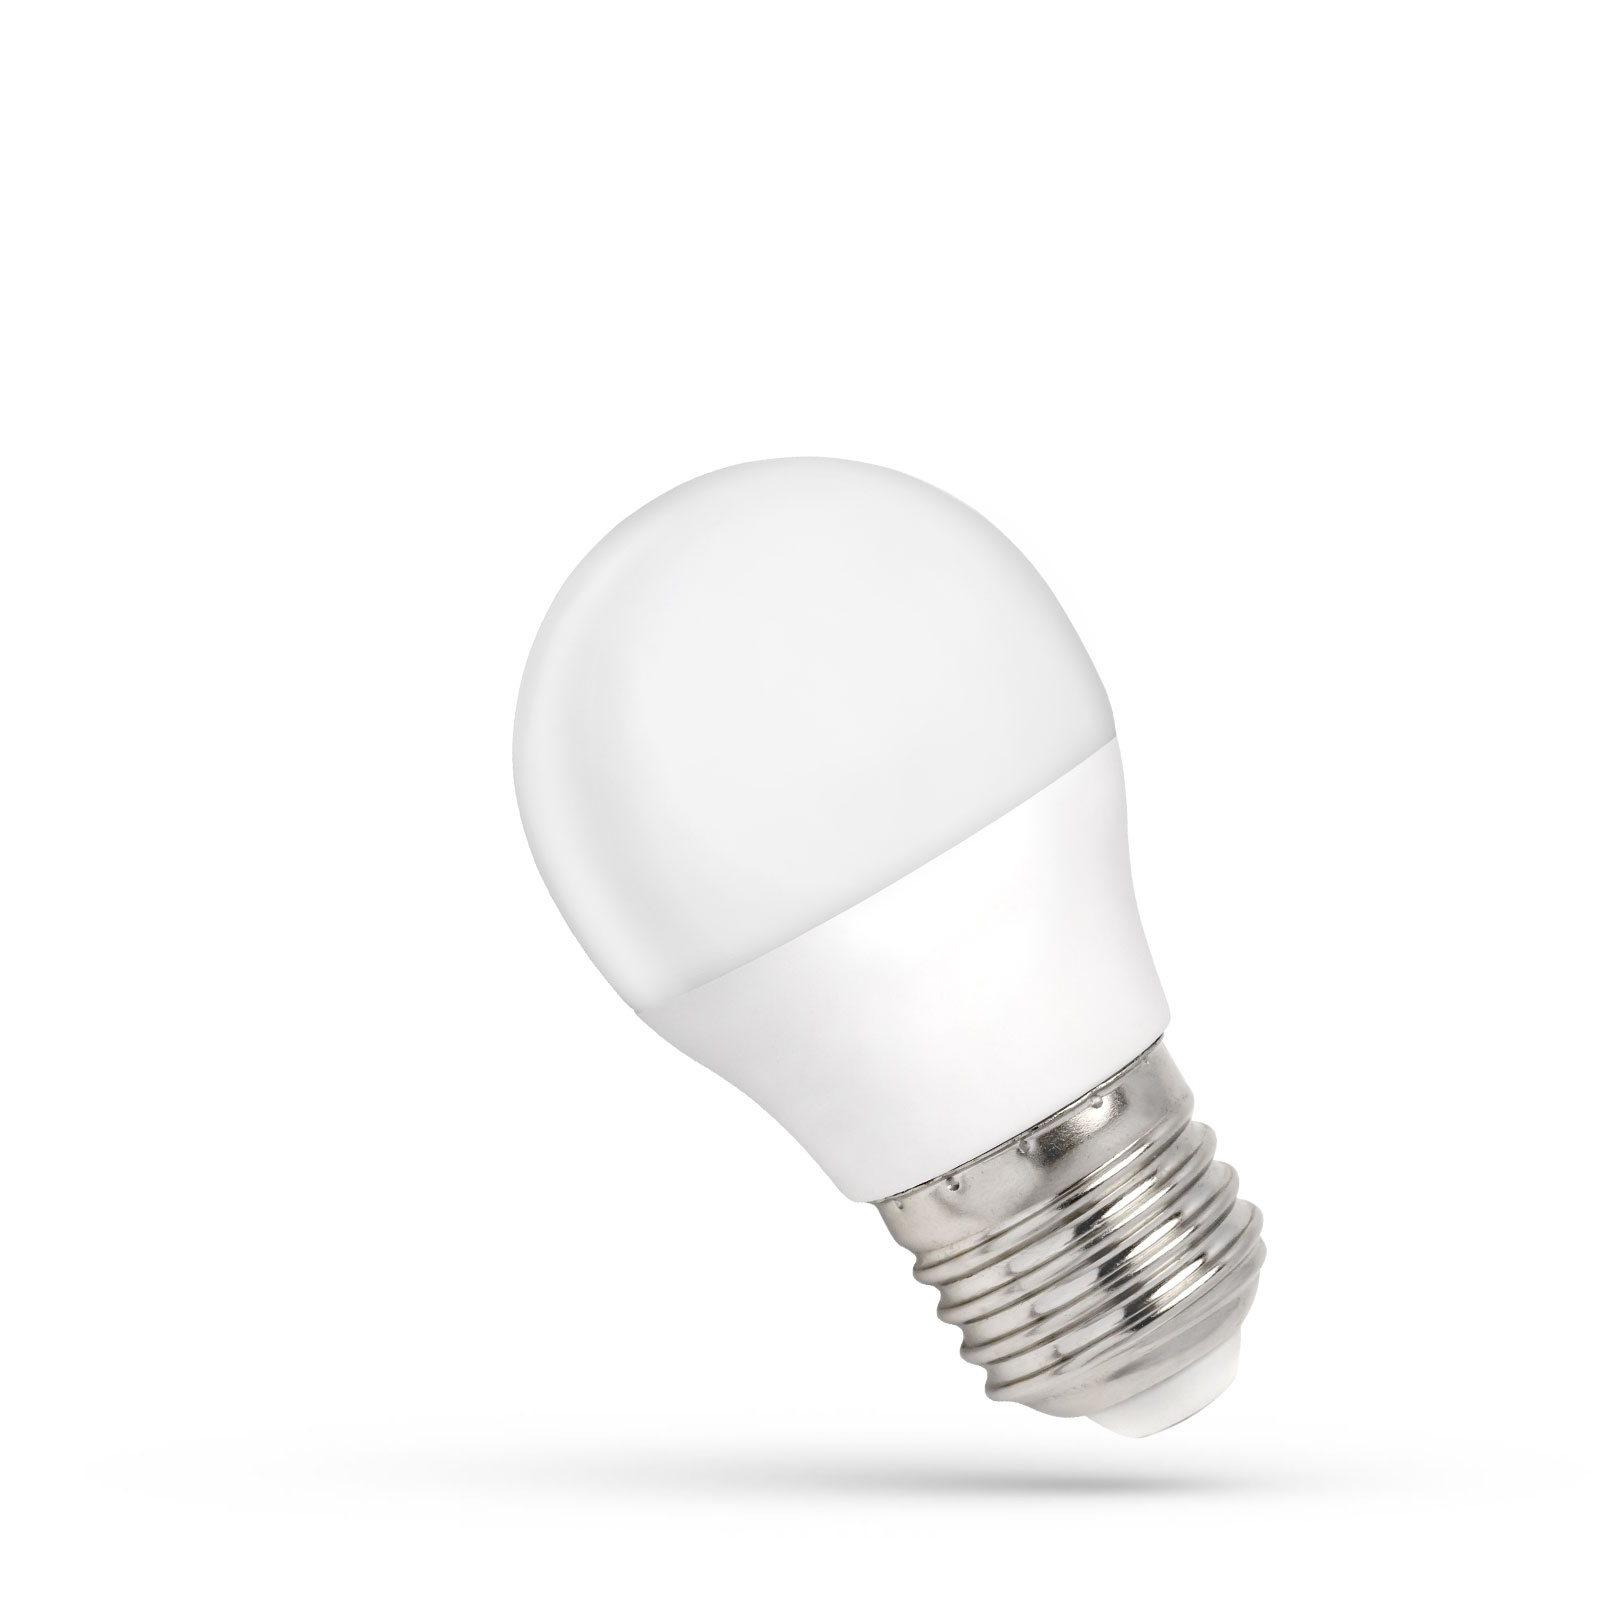 LED  žárovka E27 4W  320lm  G45 teplá, ekvivalent 30W